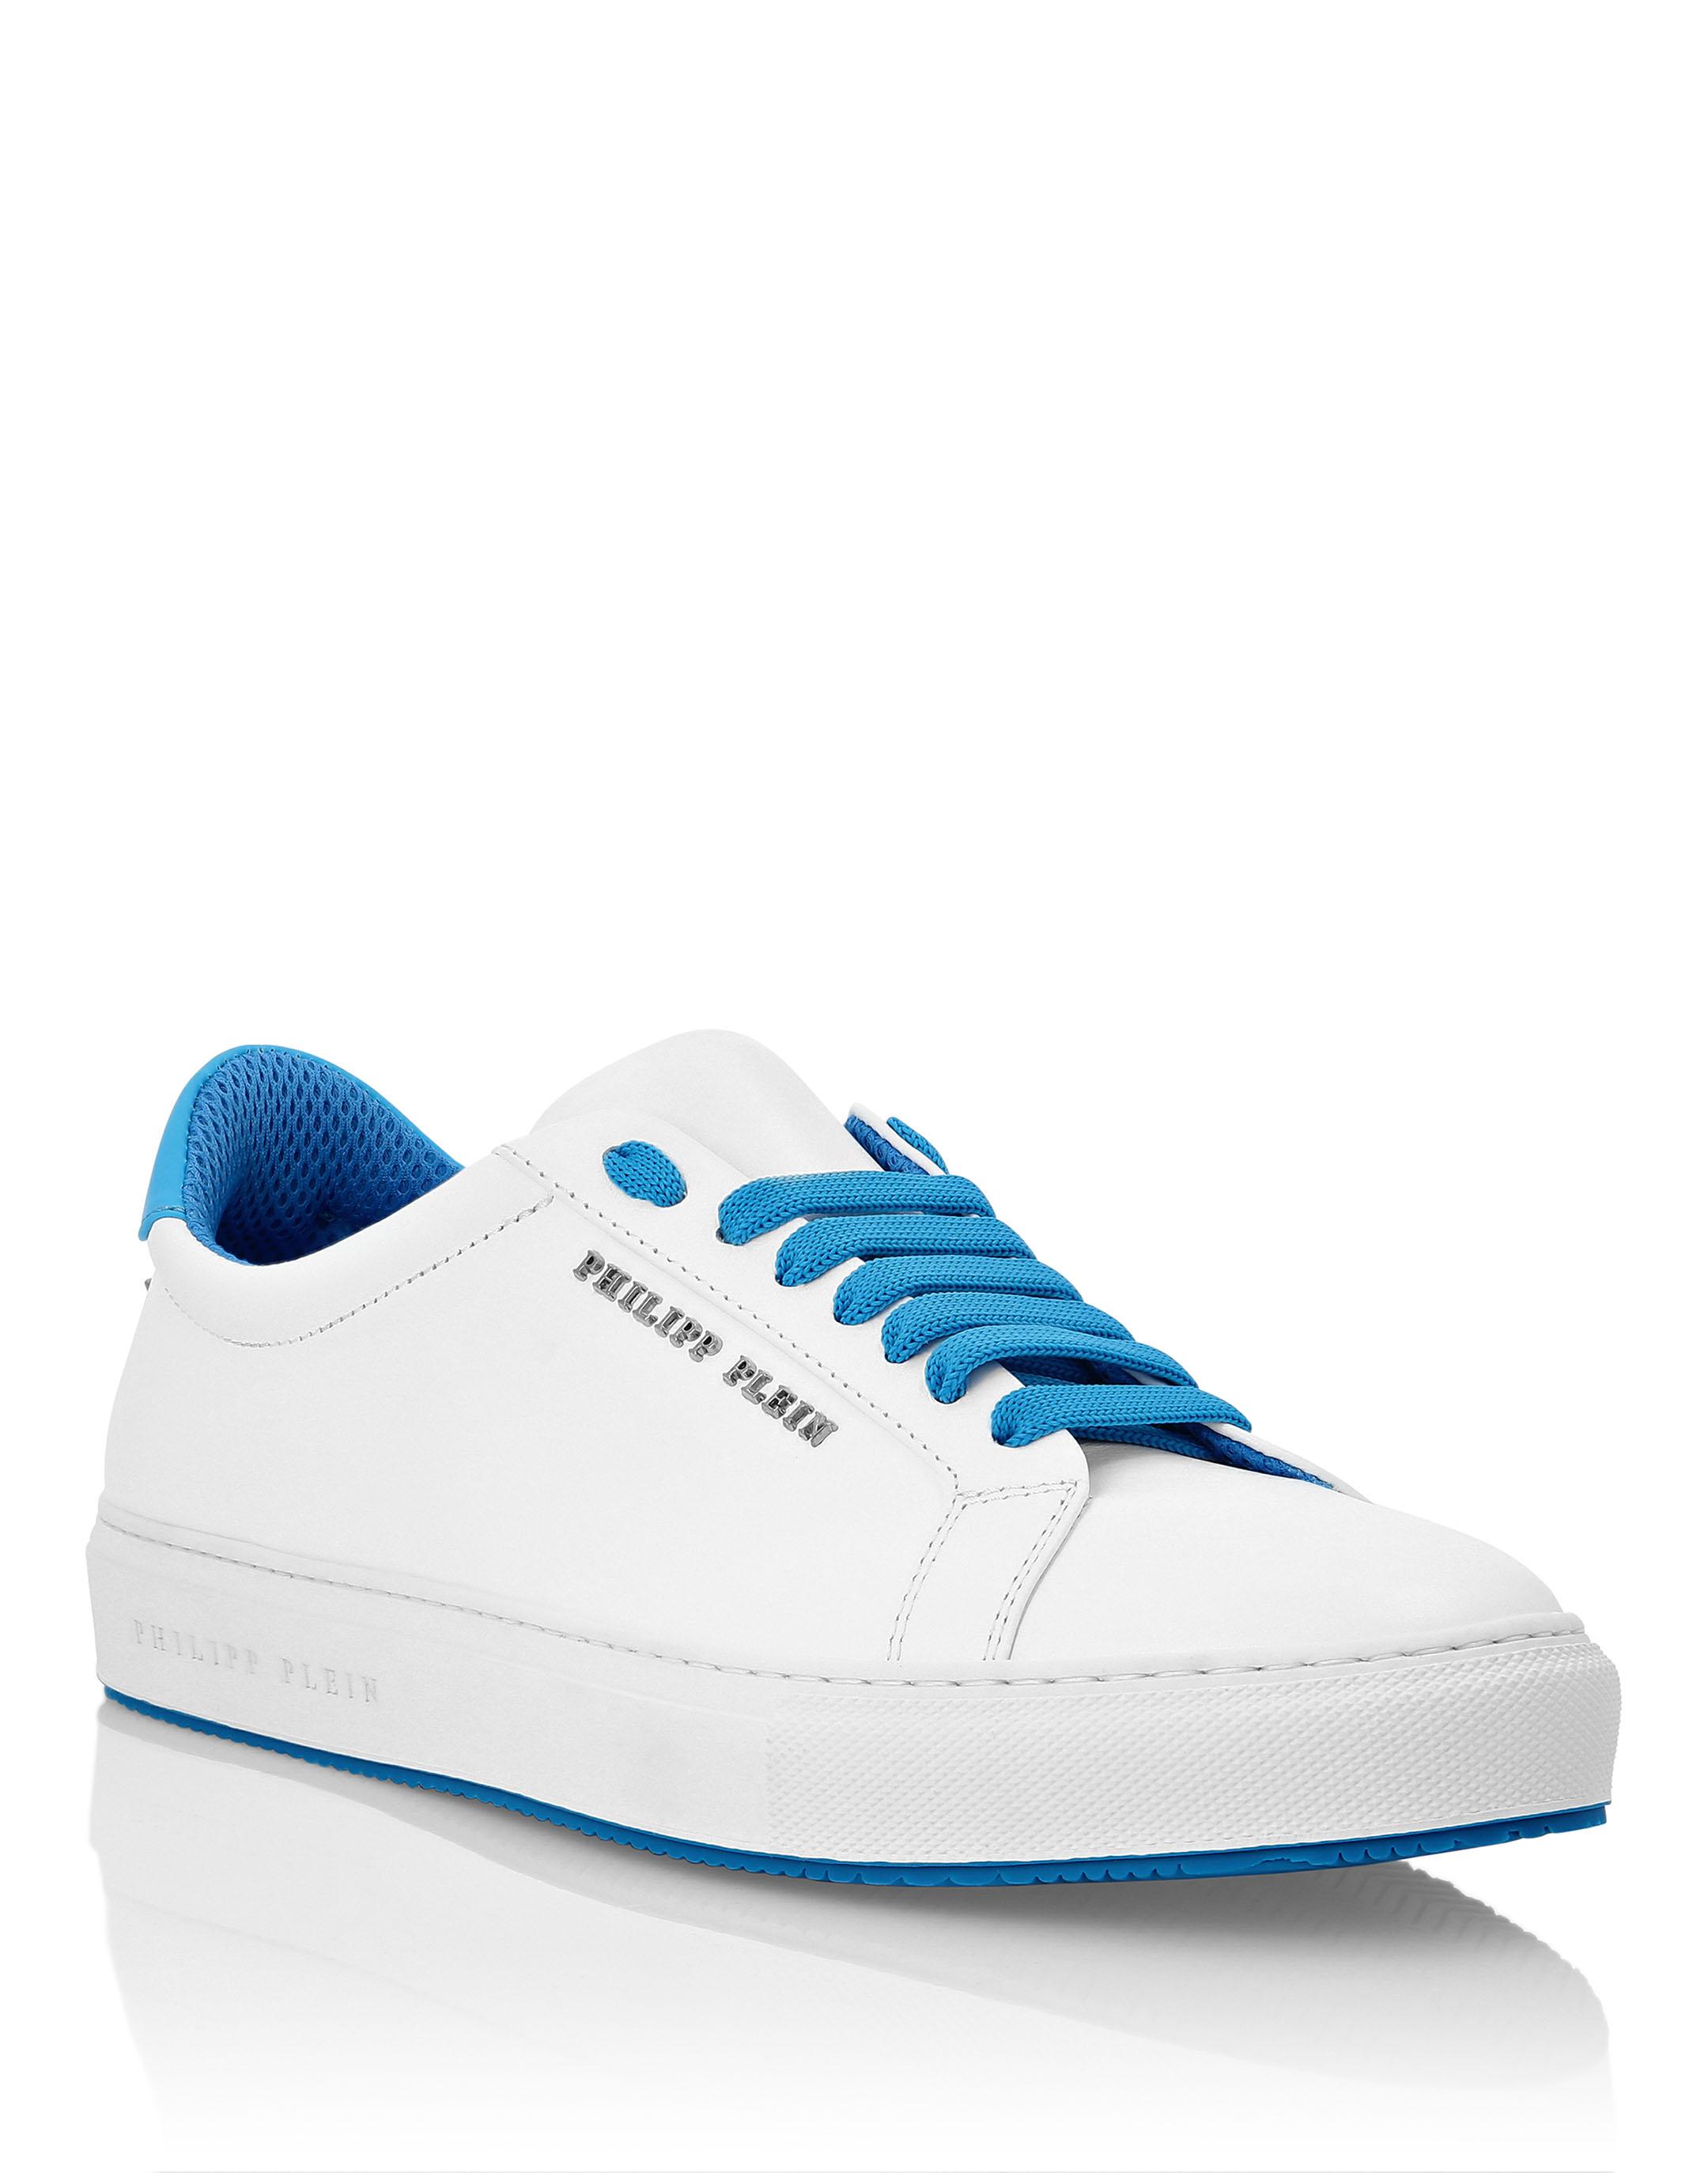 Lo-Top Sneakers Colorfull   Philipp Plein